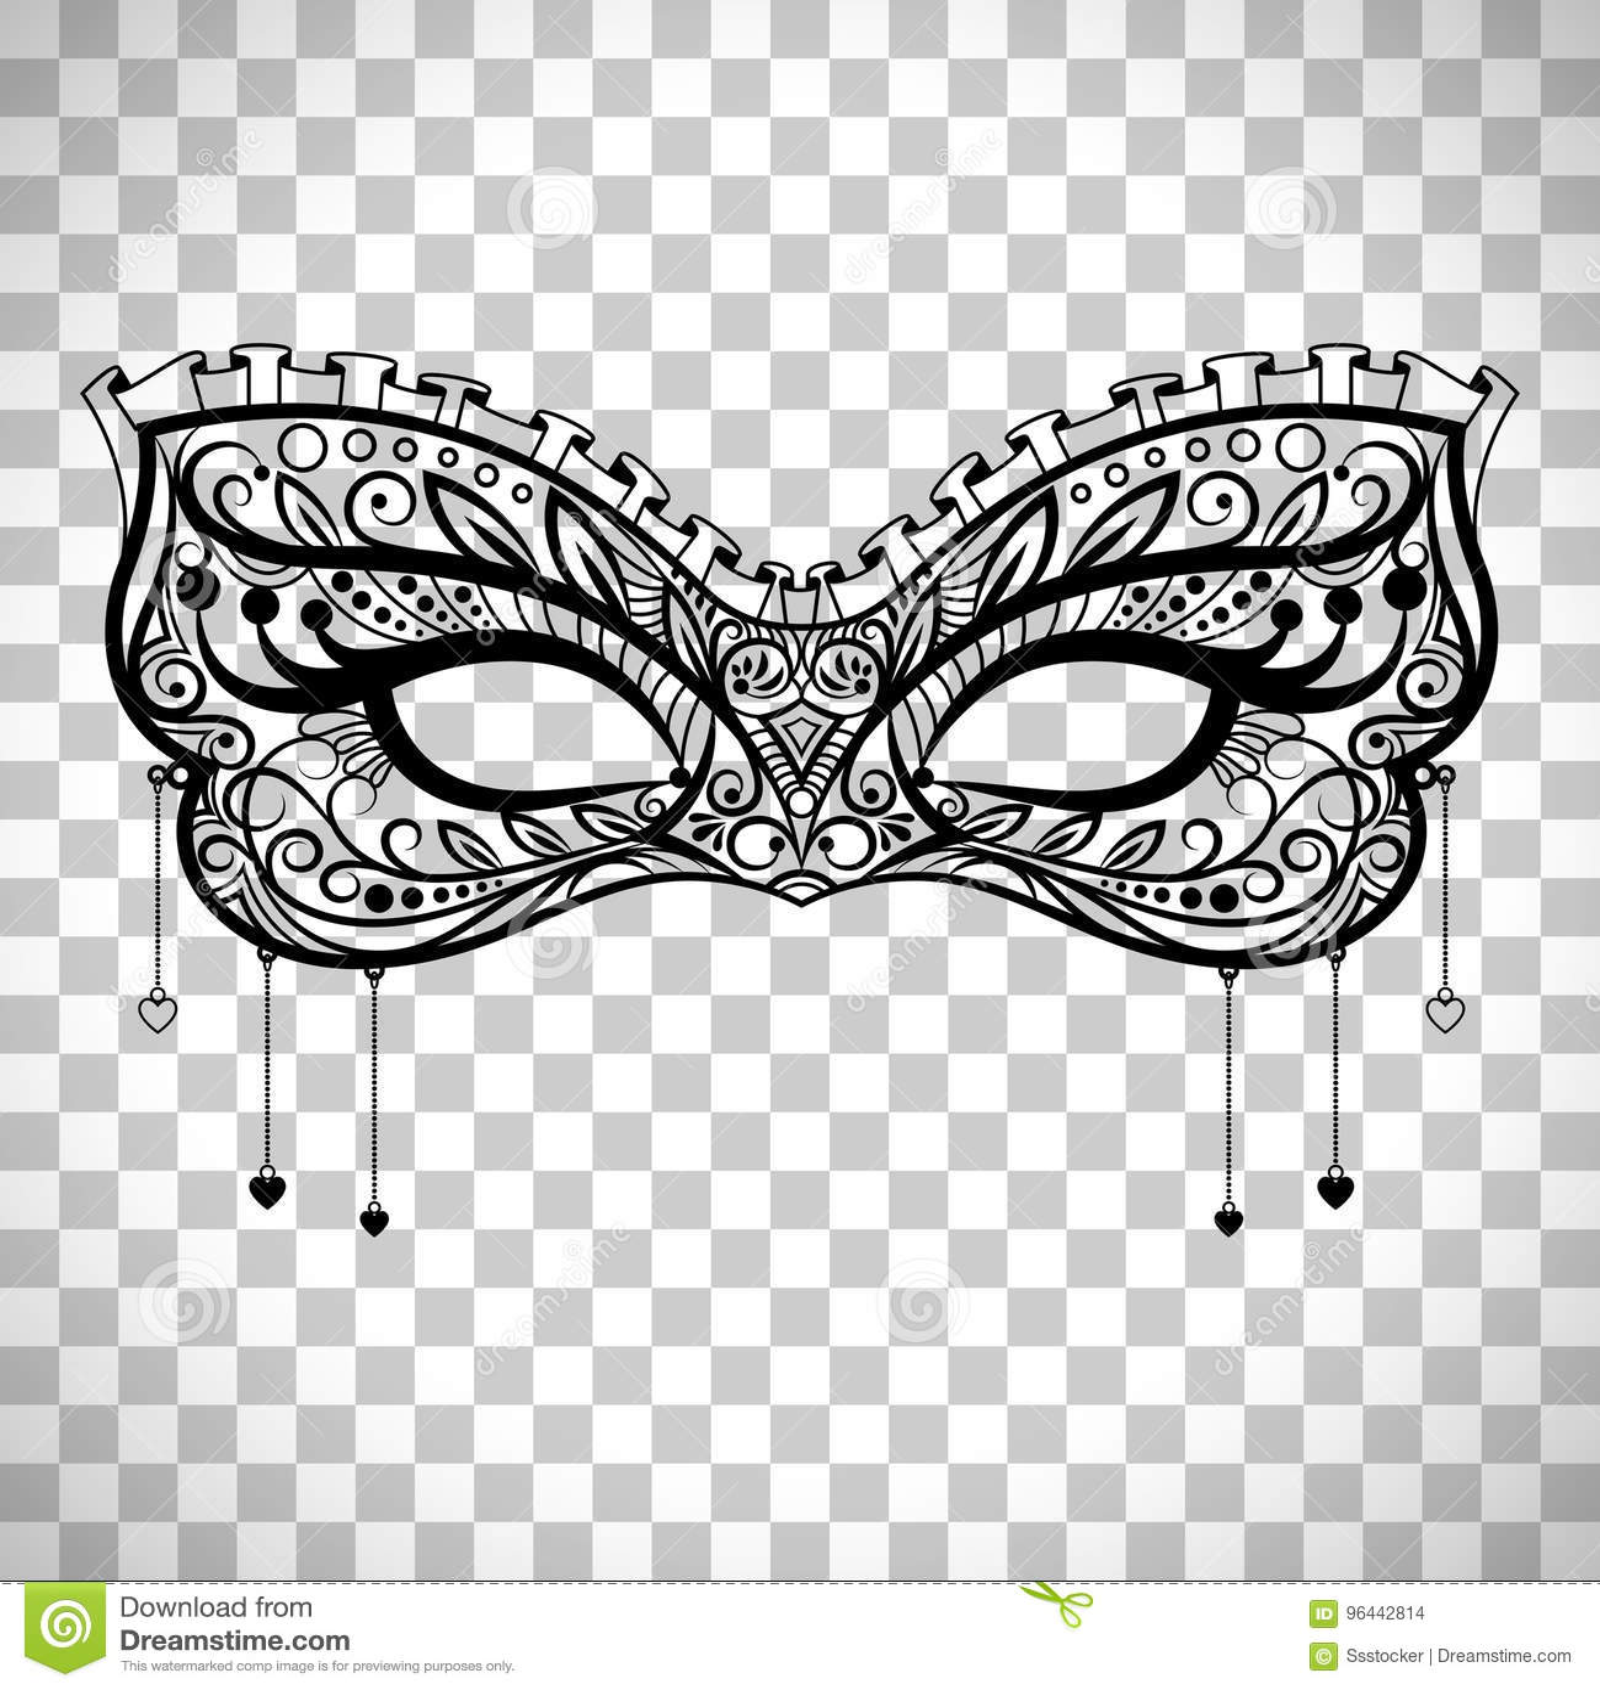 Transparent Background Masquerade Mask Stock Illustrations ...  Masquerade Mask Vector